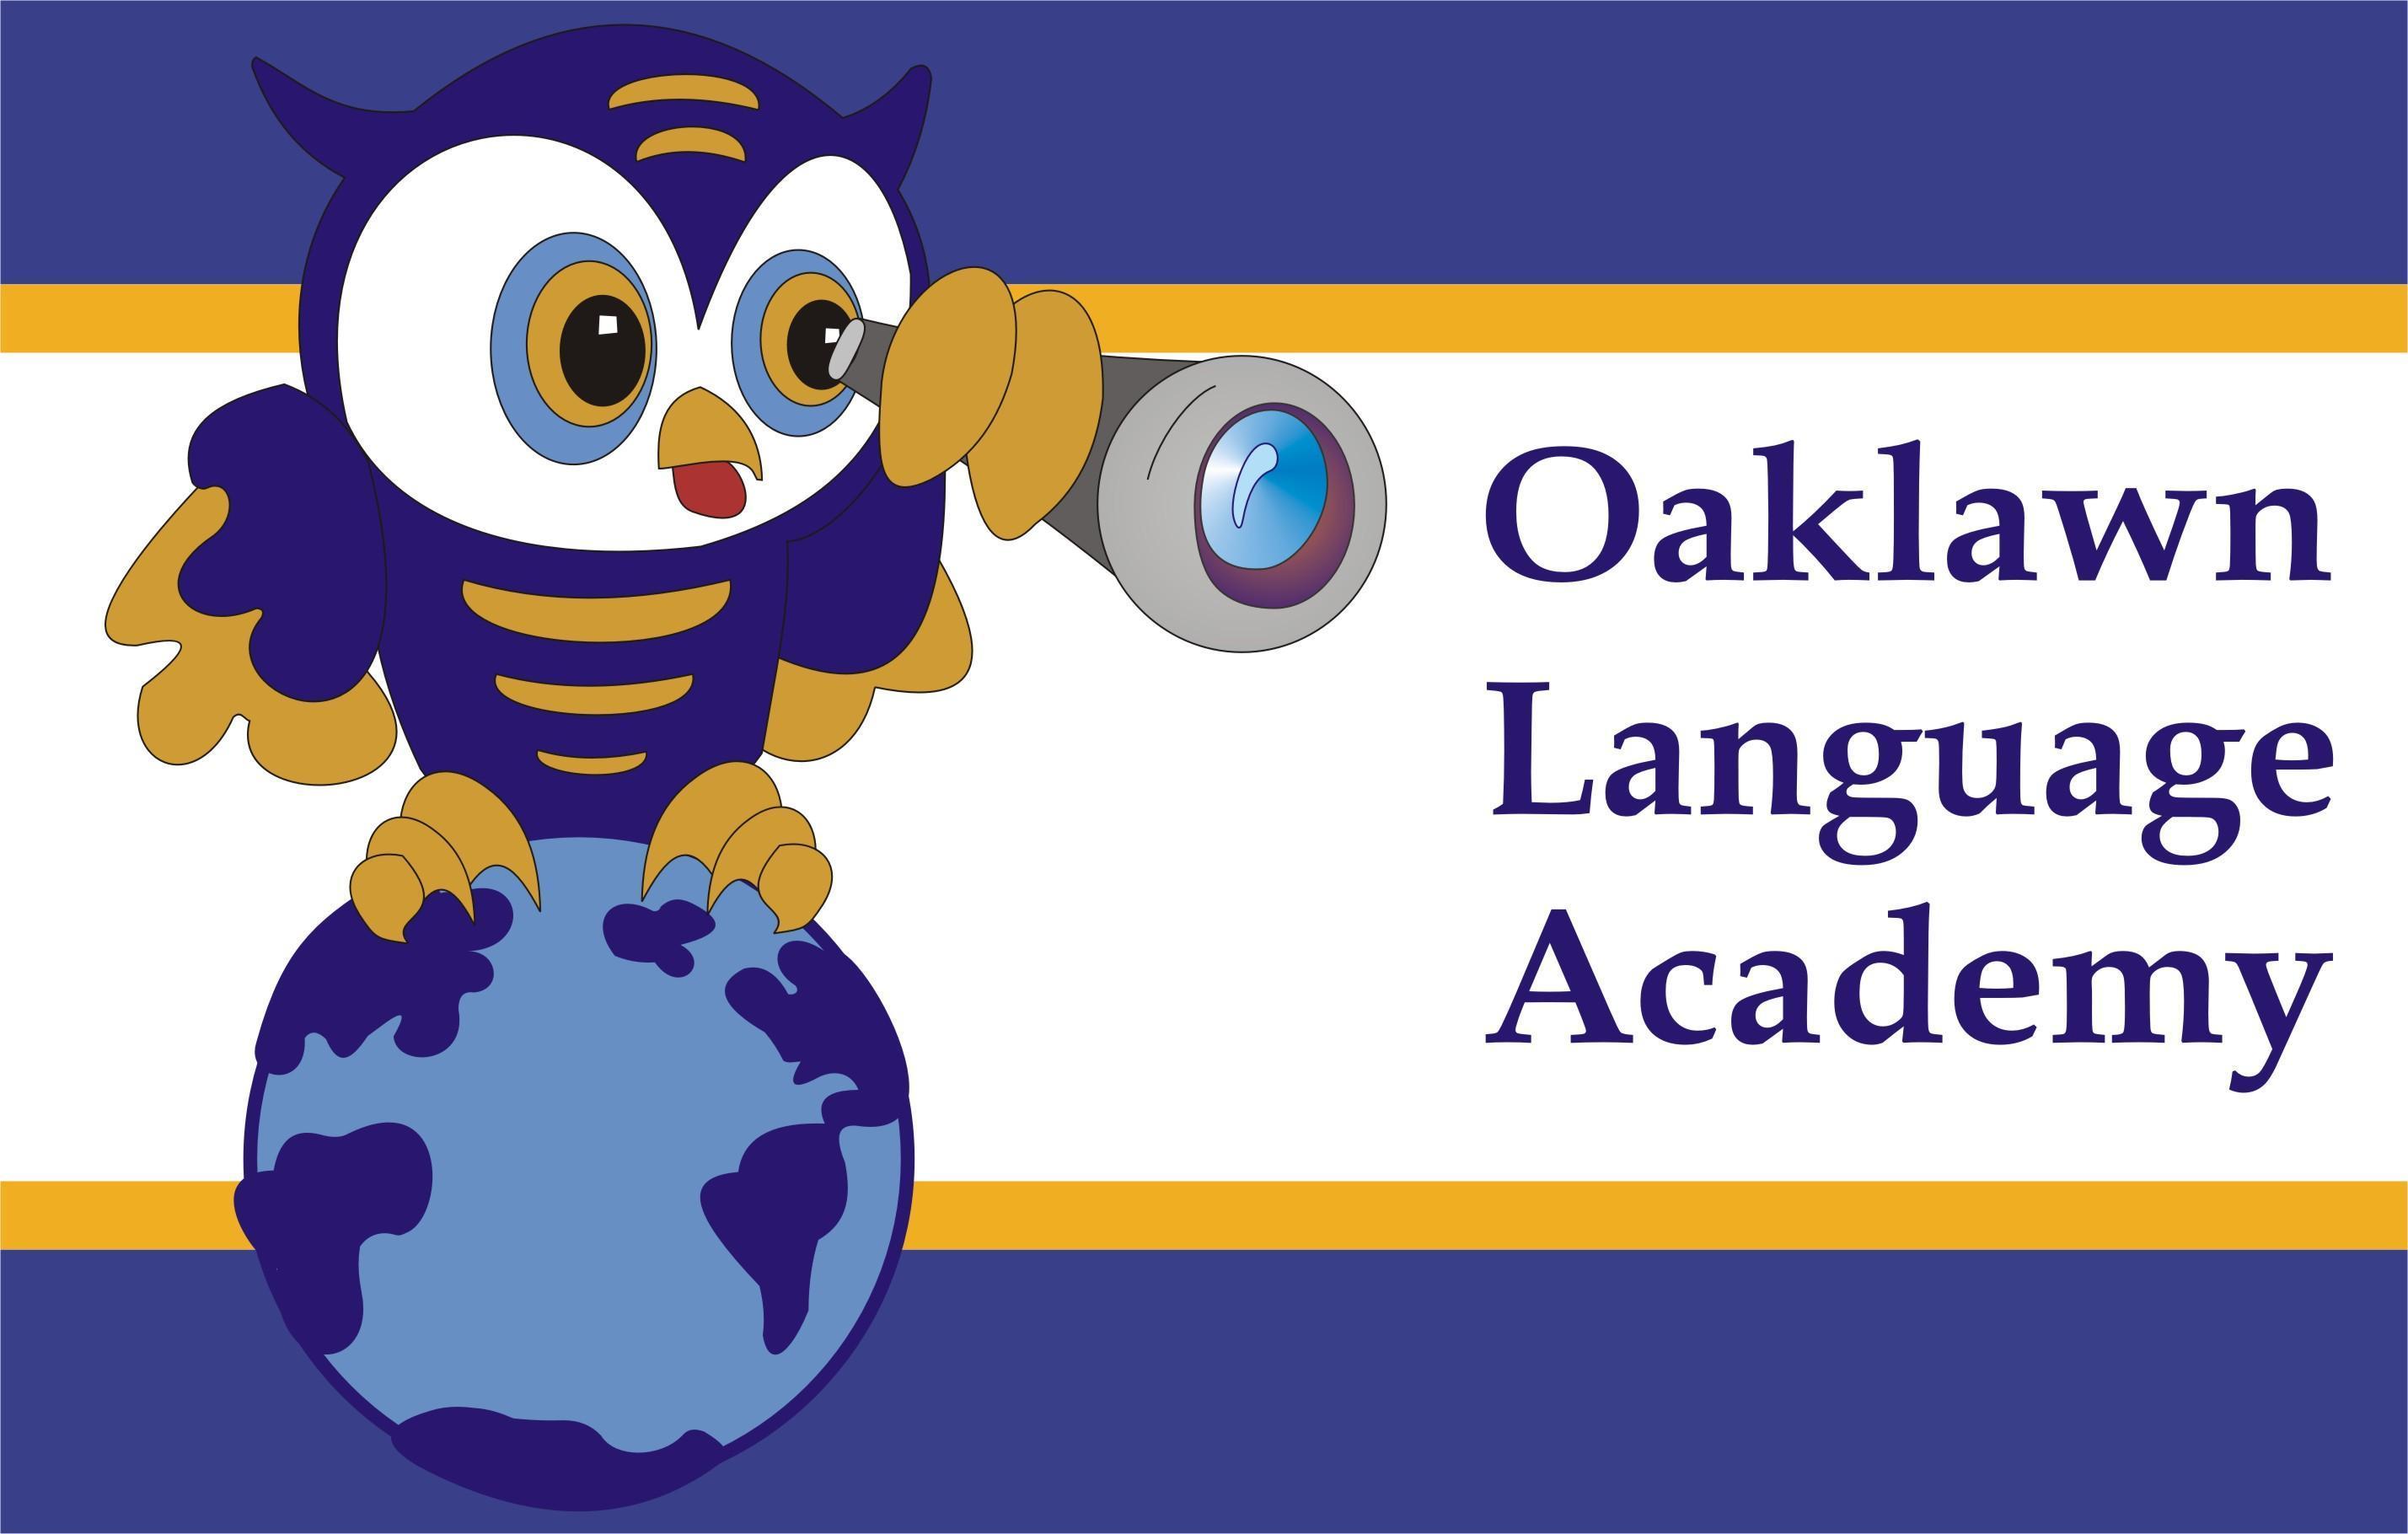 Oaklawn Language Academy